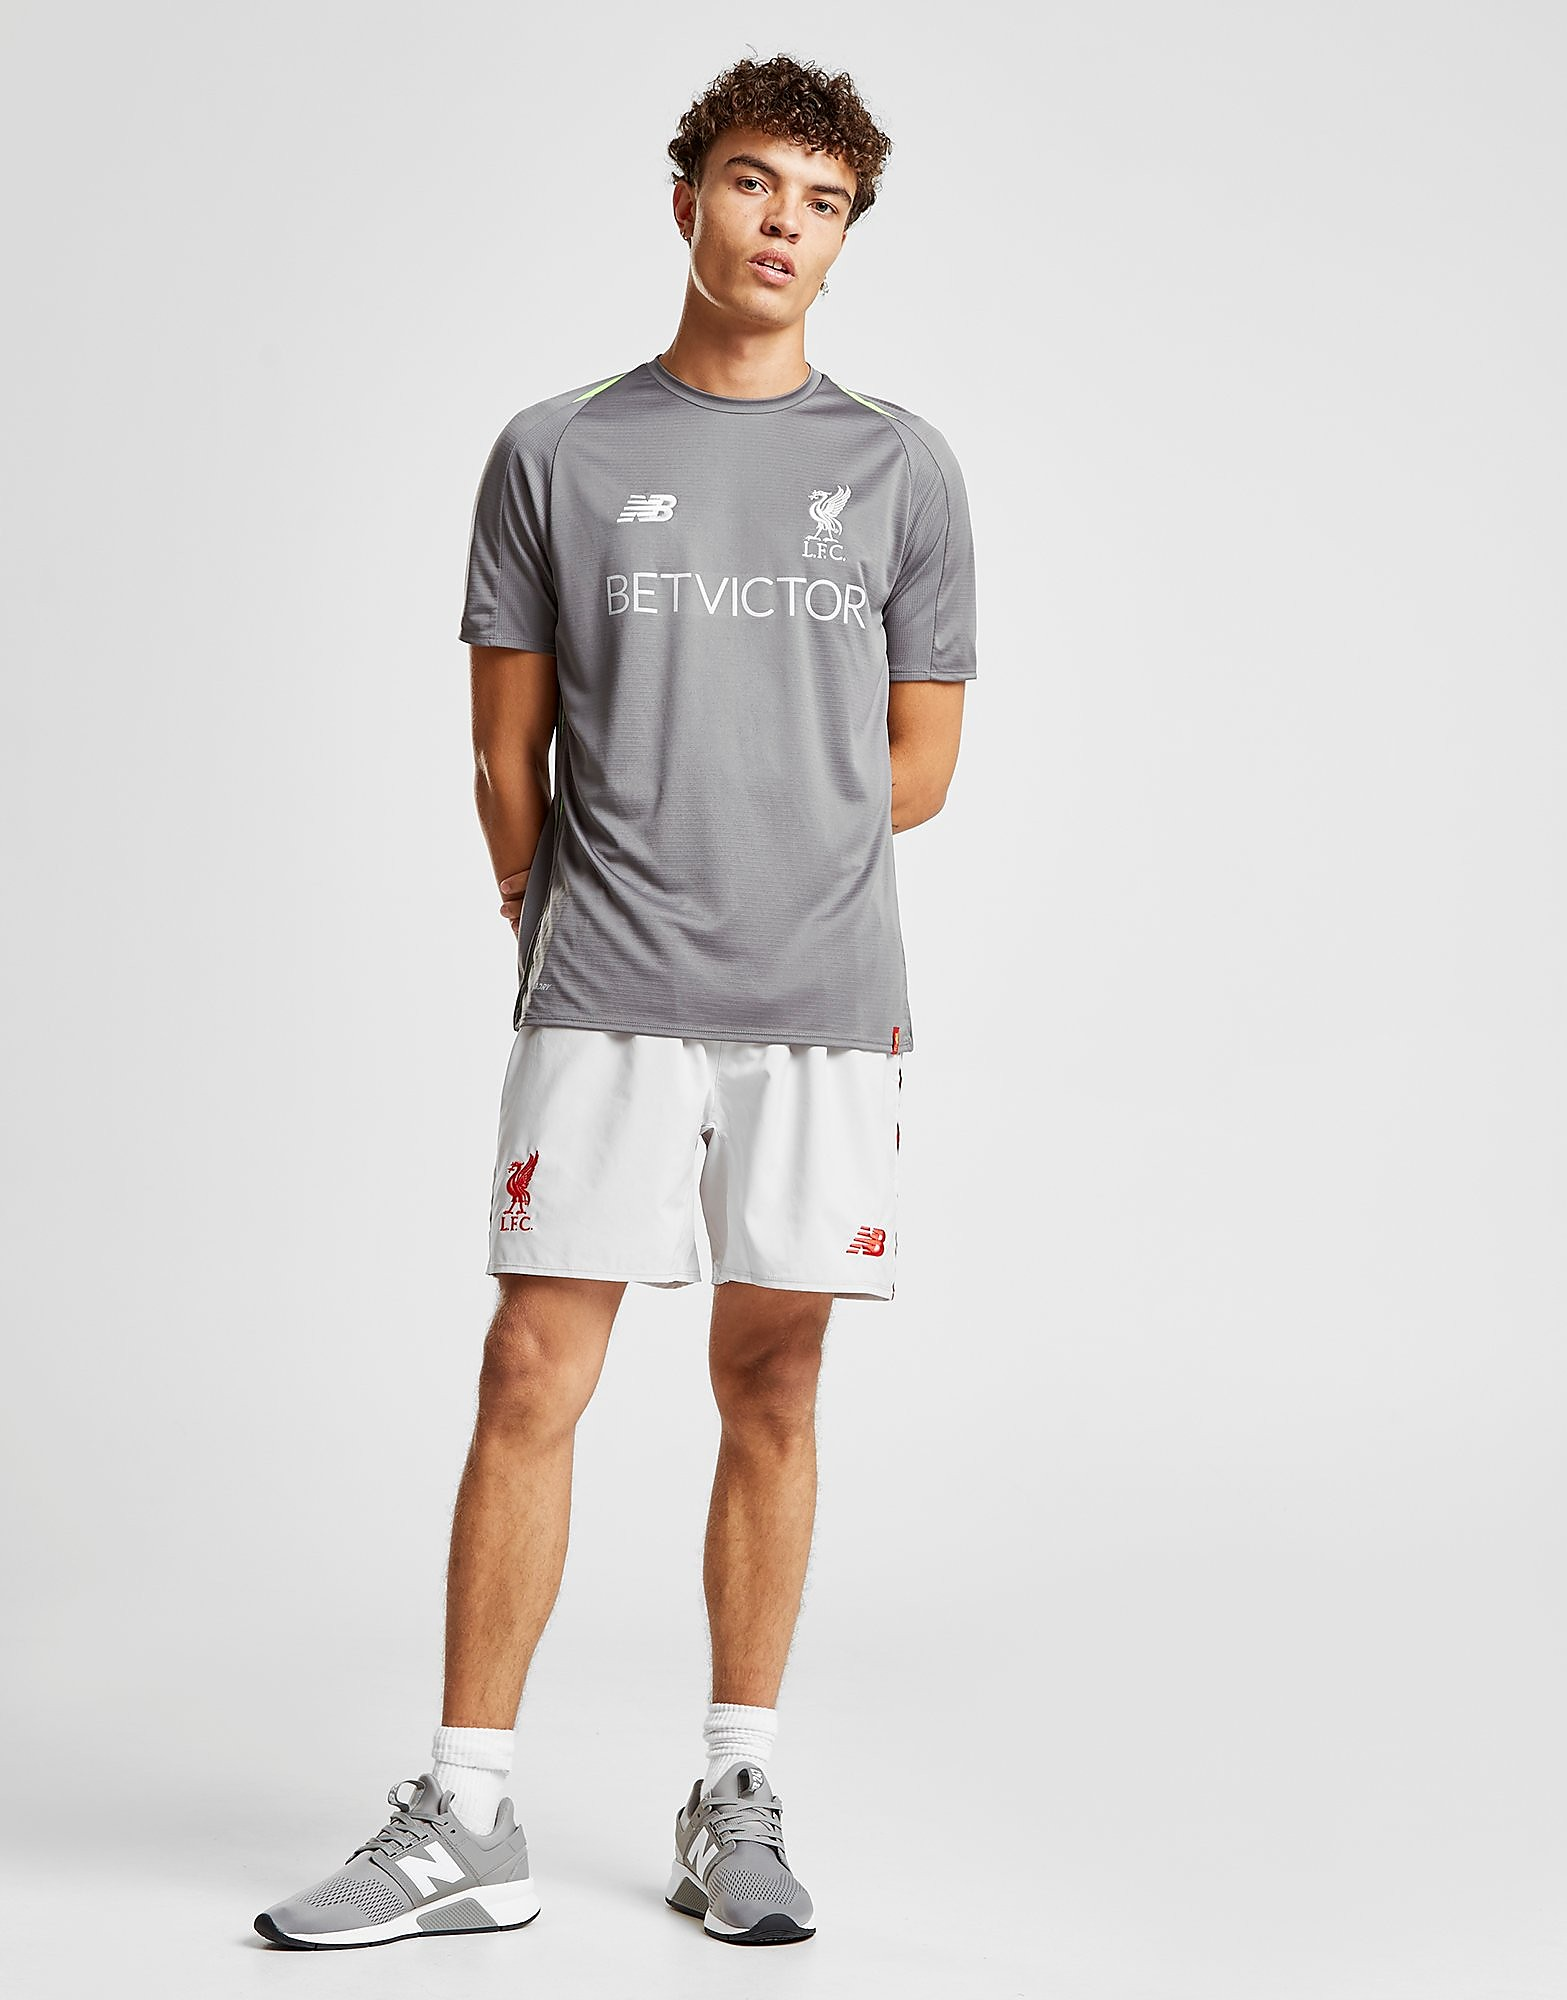 New Balance Liverpool FC Training Shirt